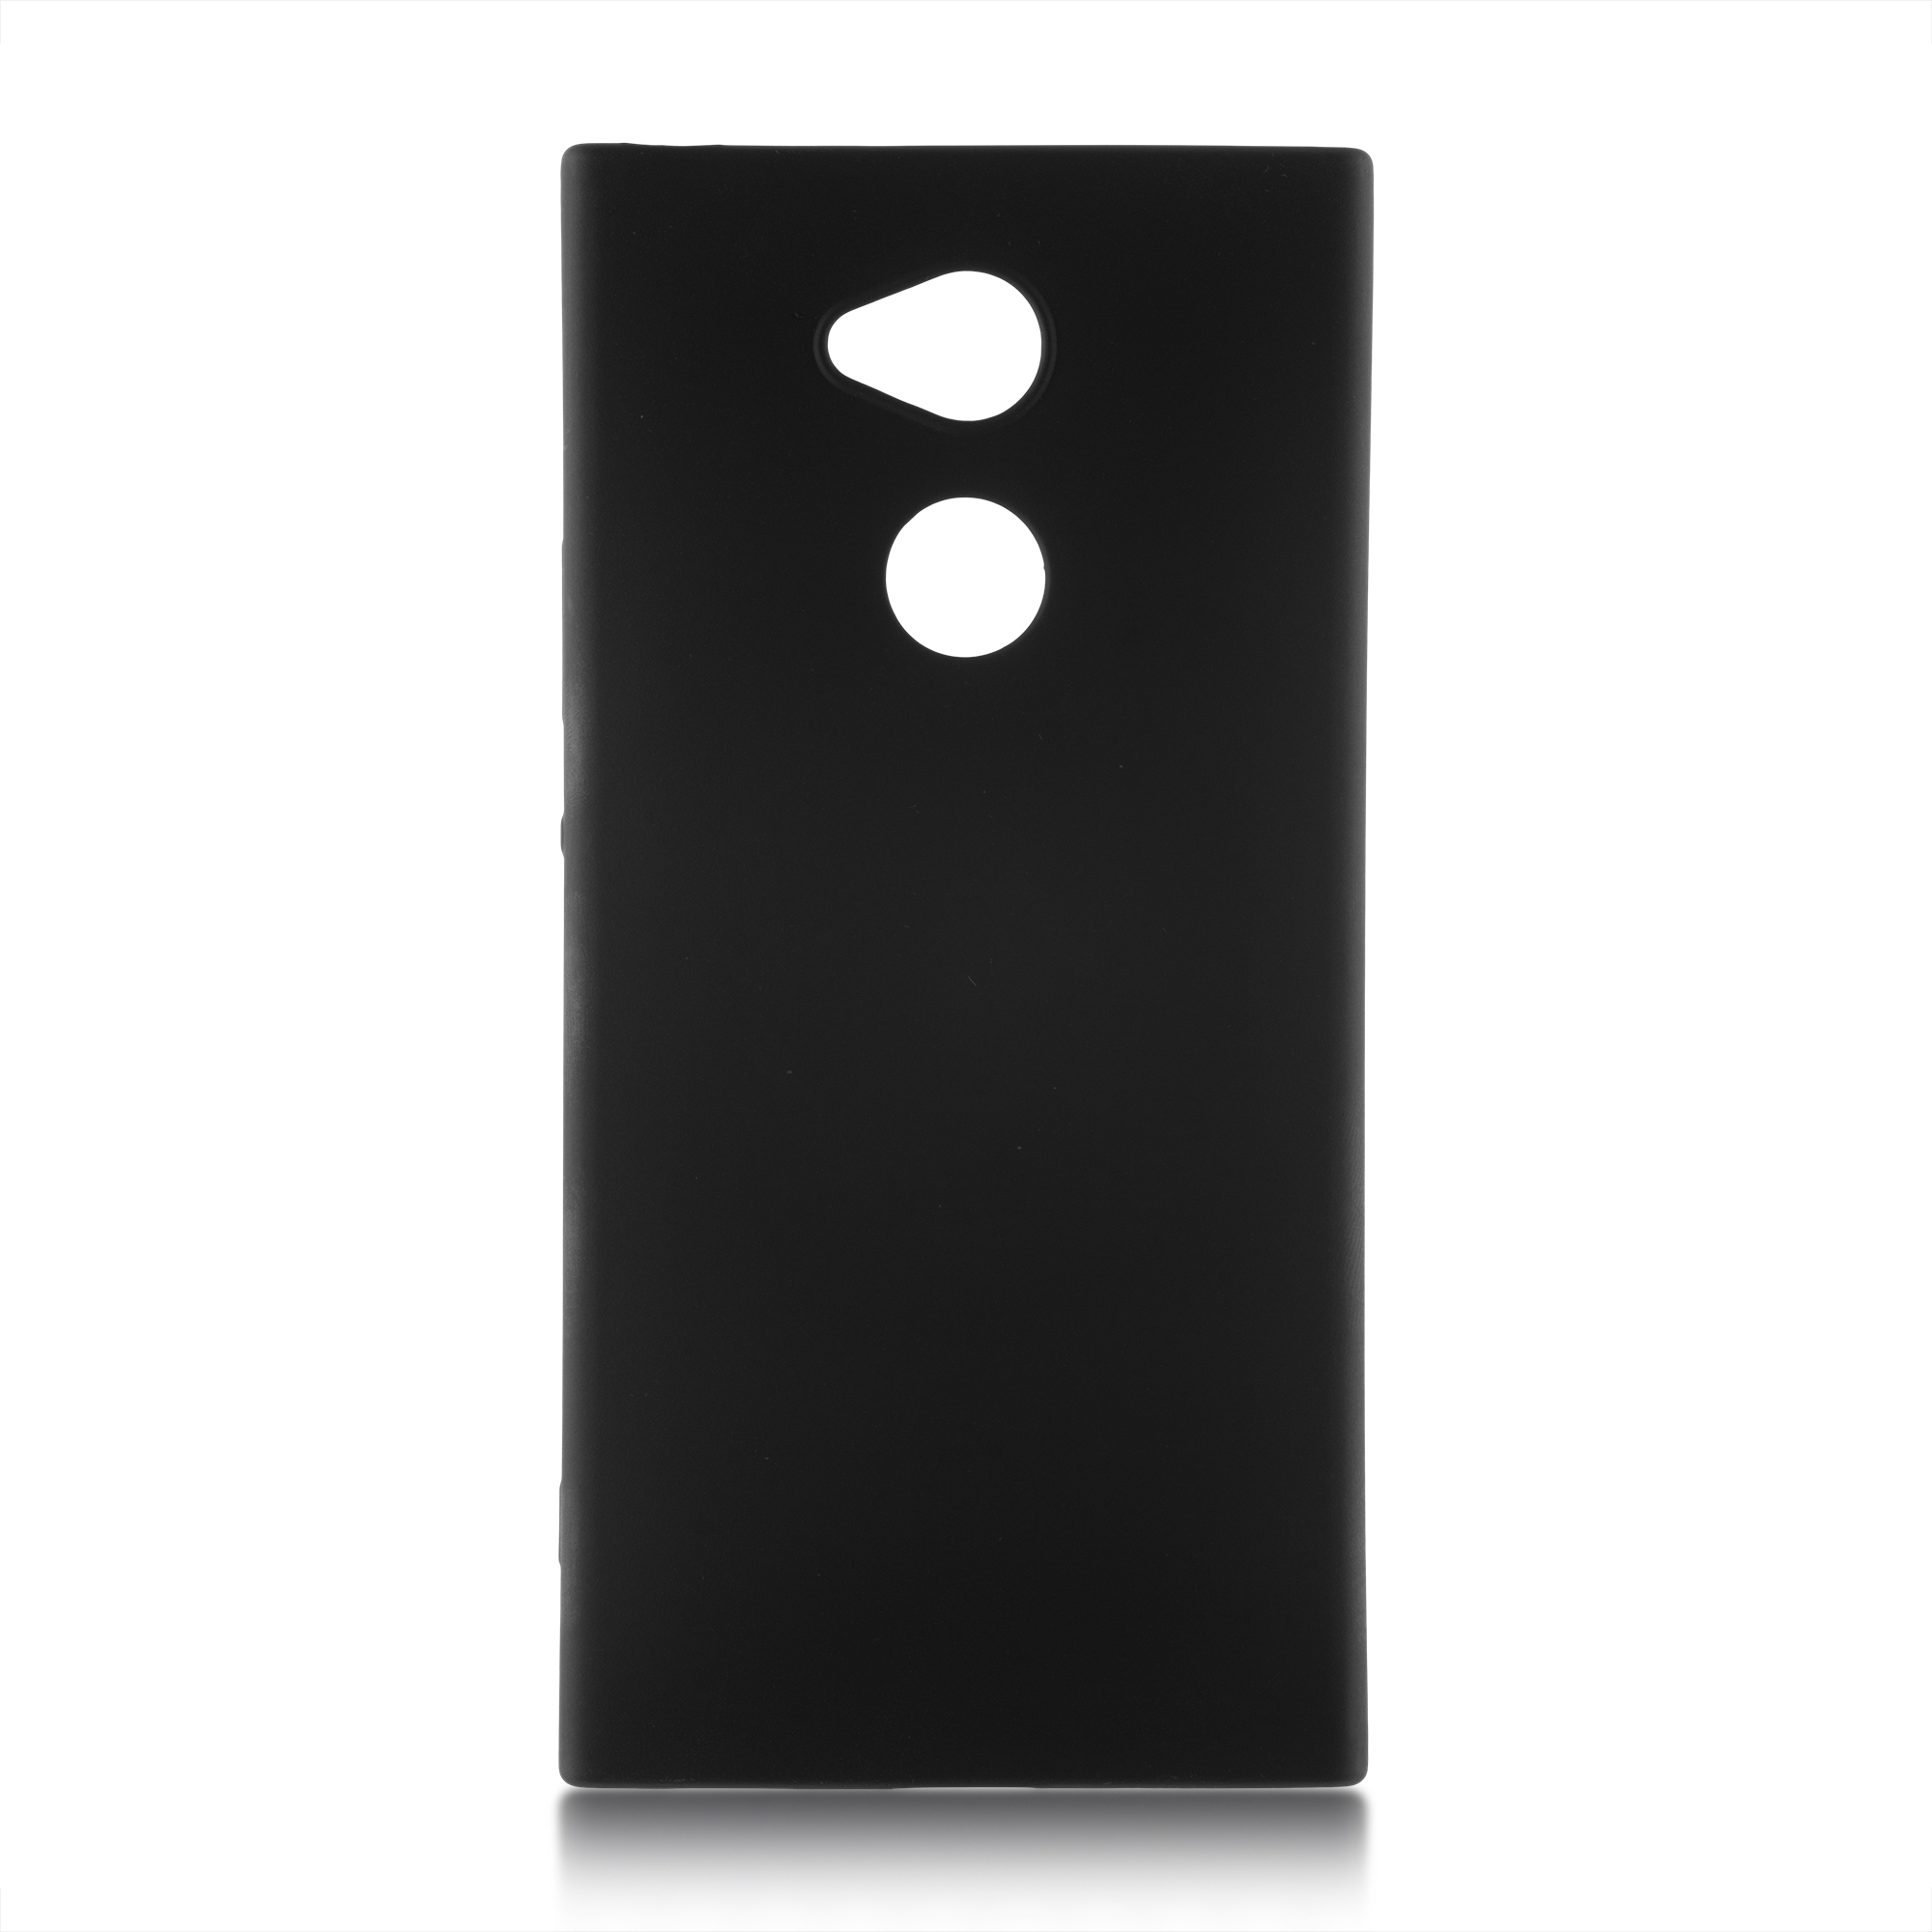 Пластиковый бампер чёрного цвета для Xperia XA2 Plus